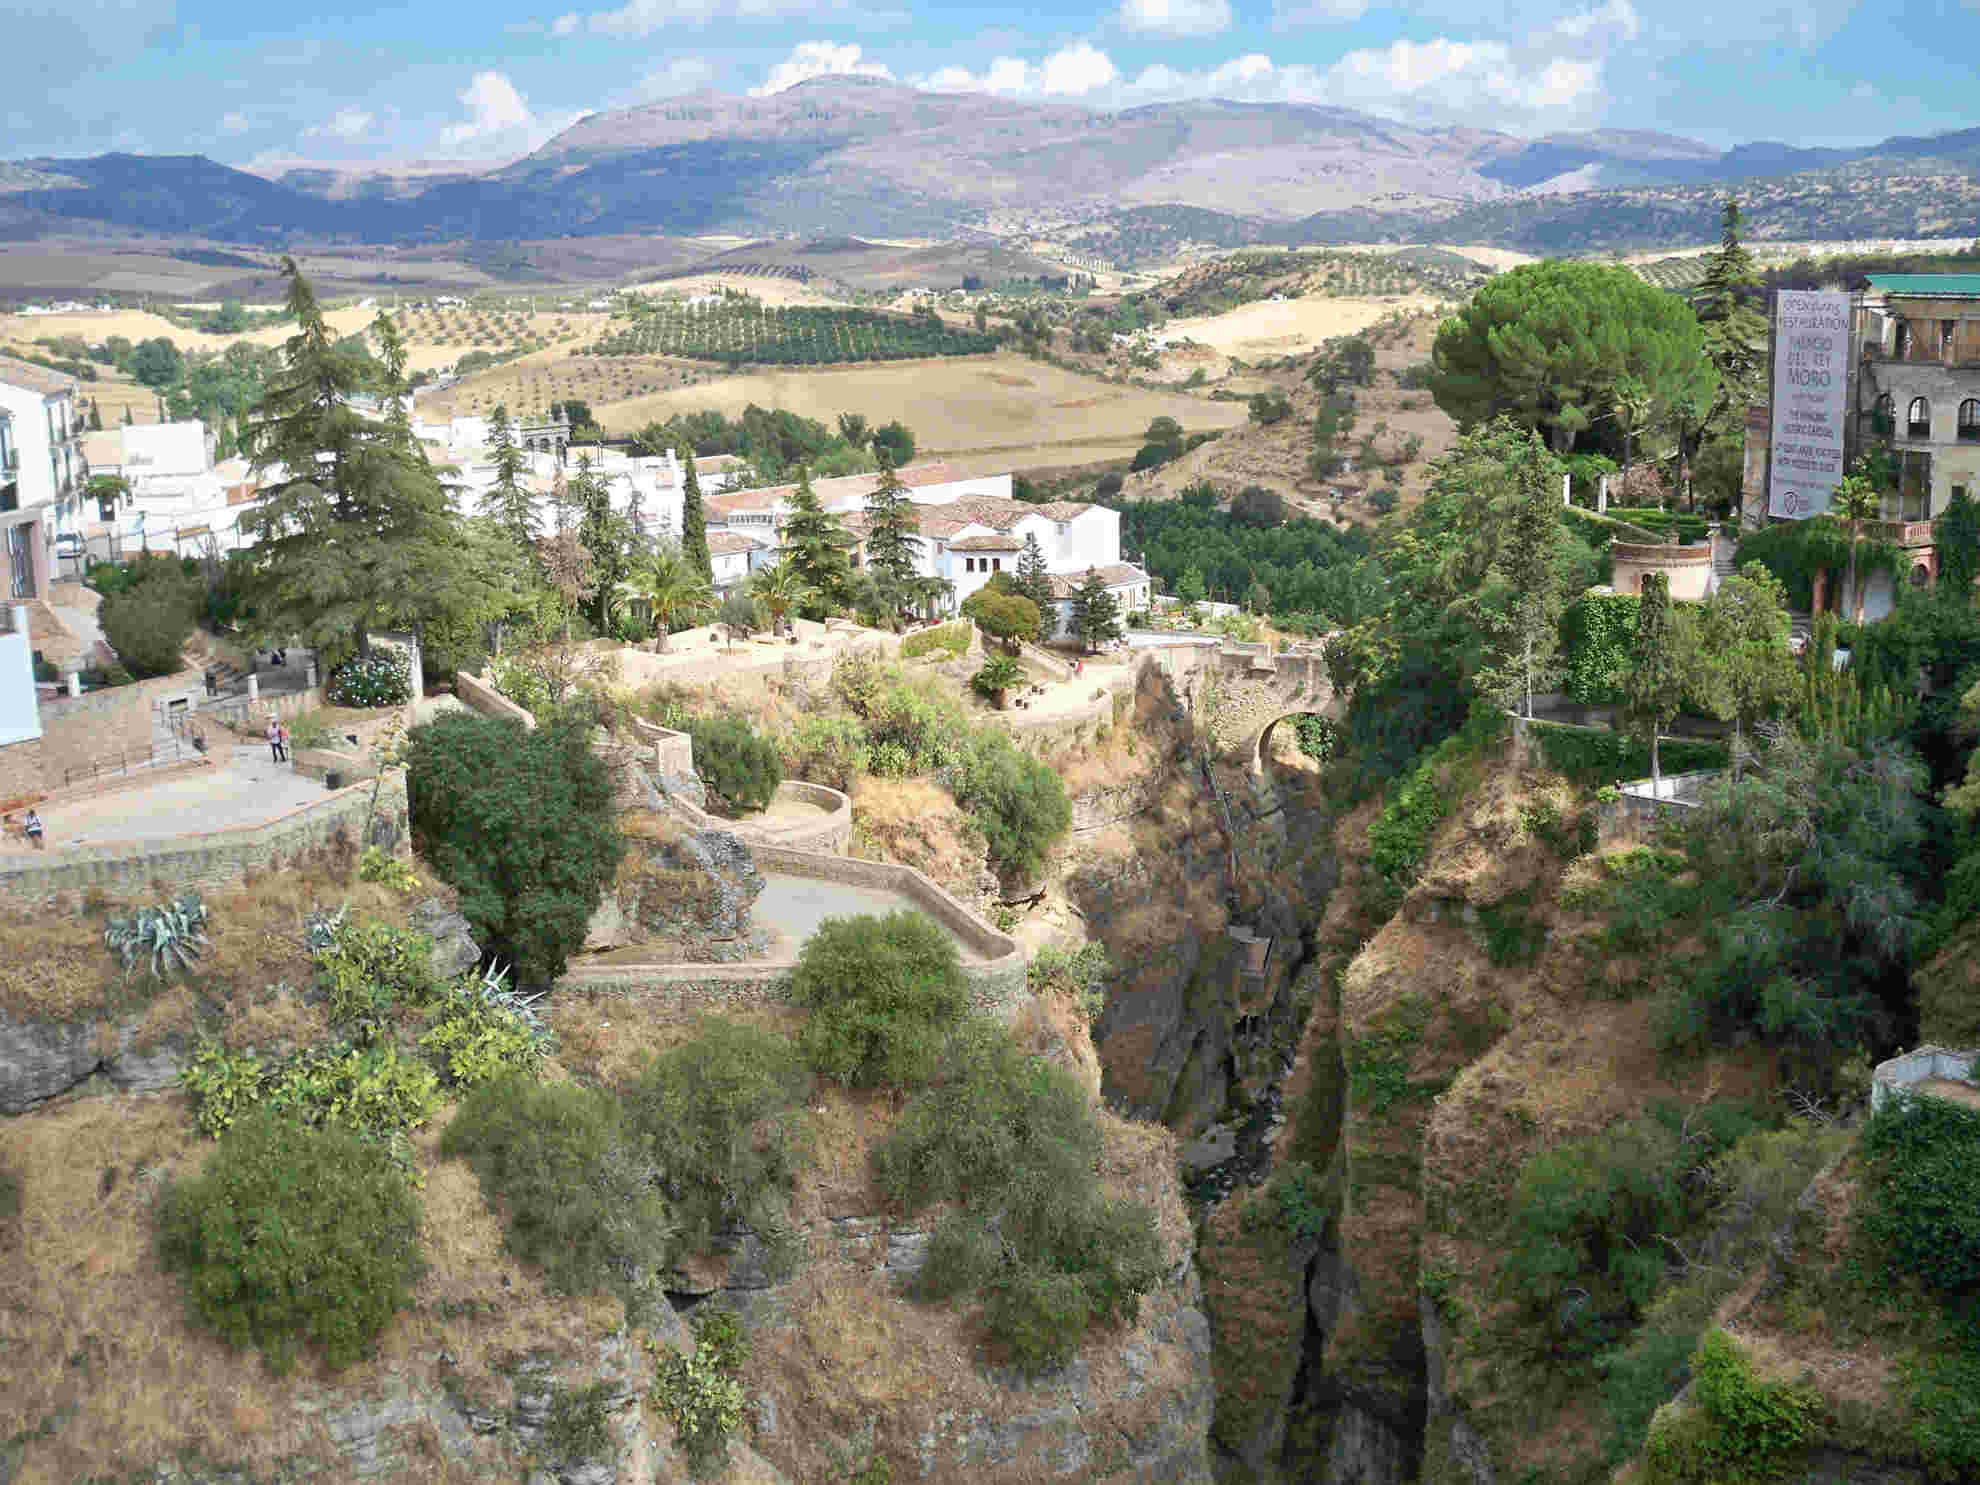 Ronda, village au bord d'un précipice - Espagne. Ronda310